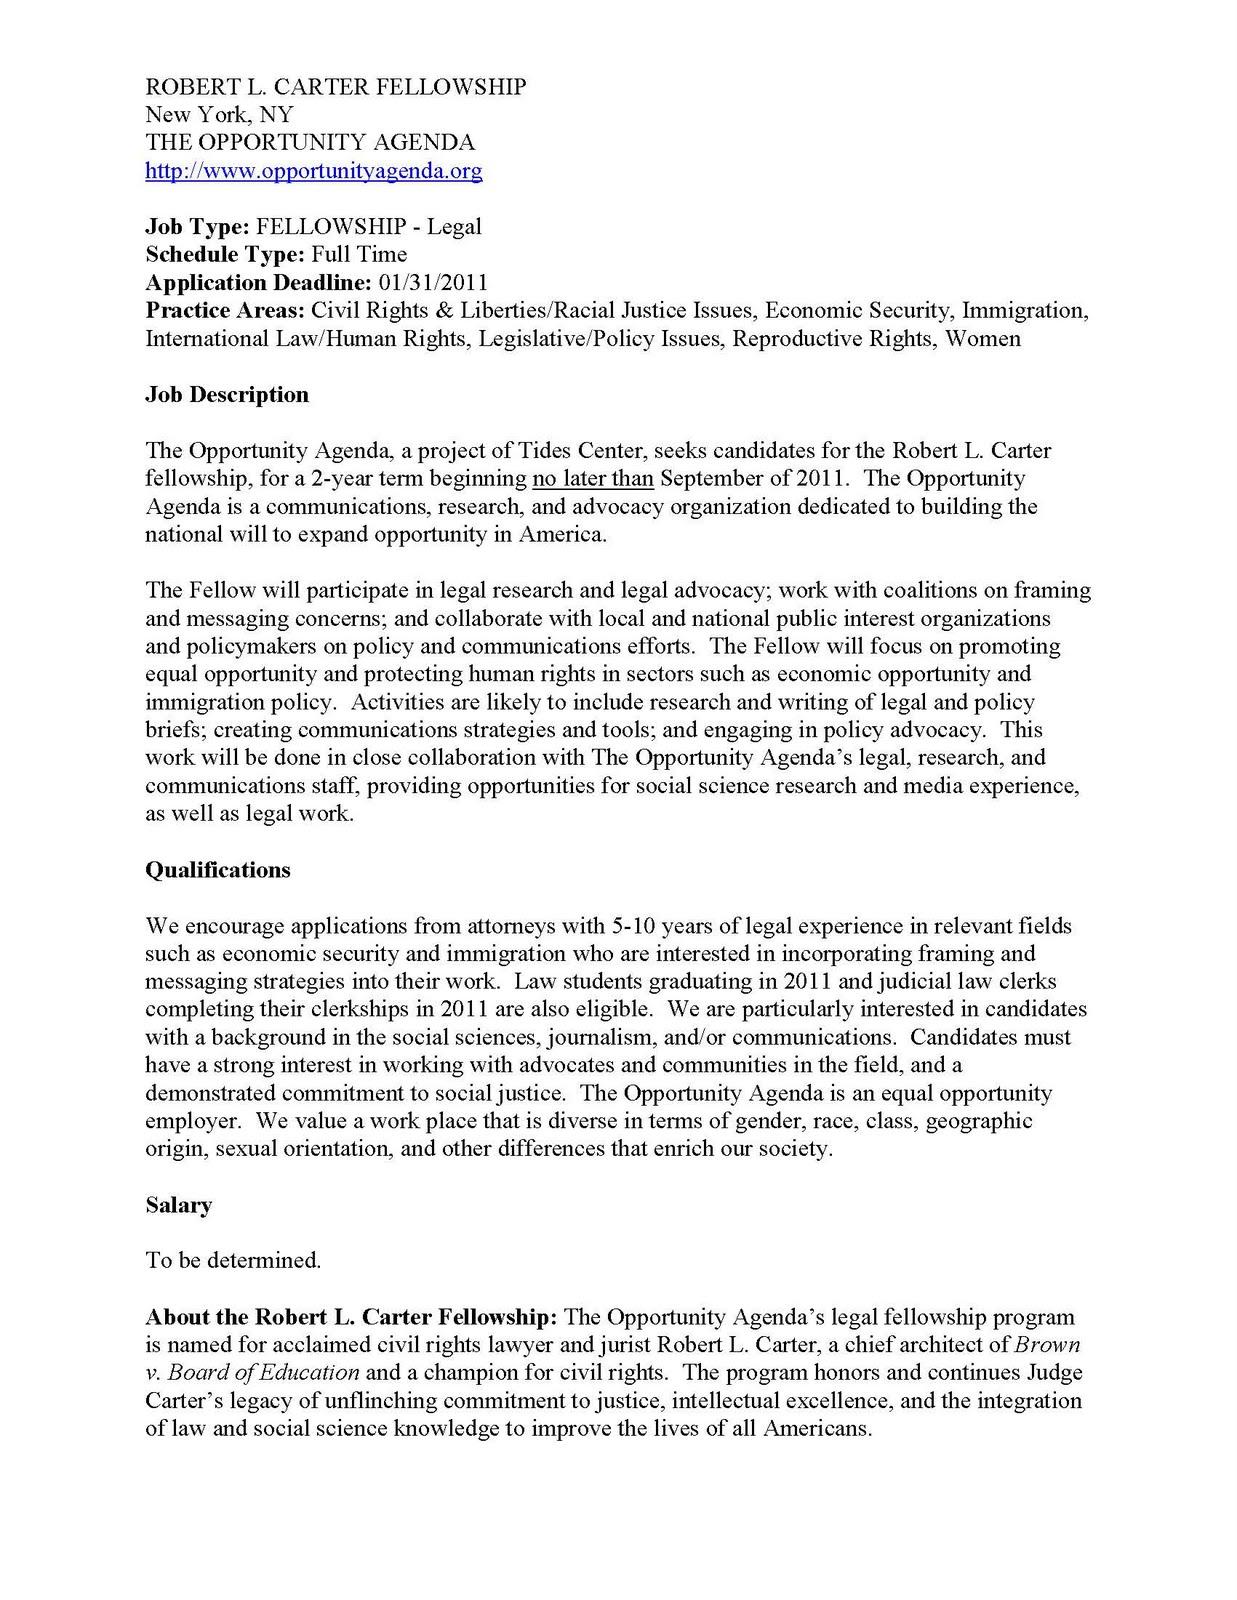 Essay\'s Helper: College Paper Help delivers 100% plagiarism ...